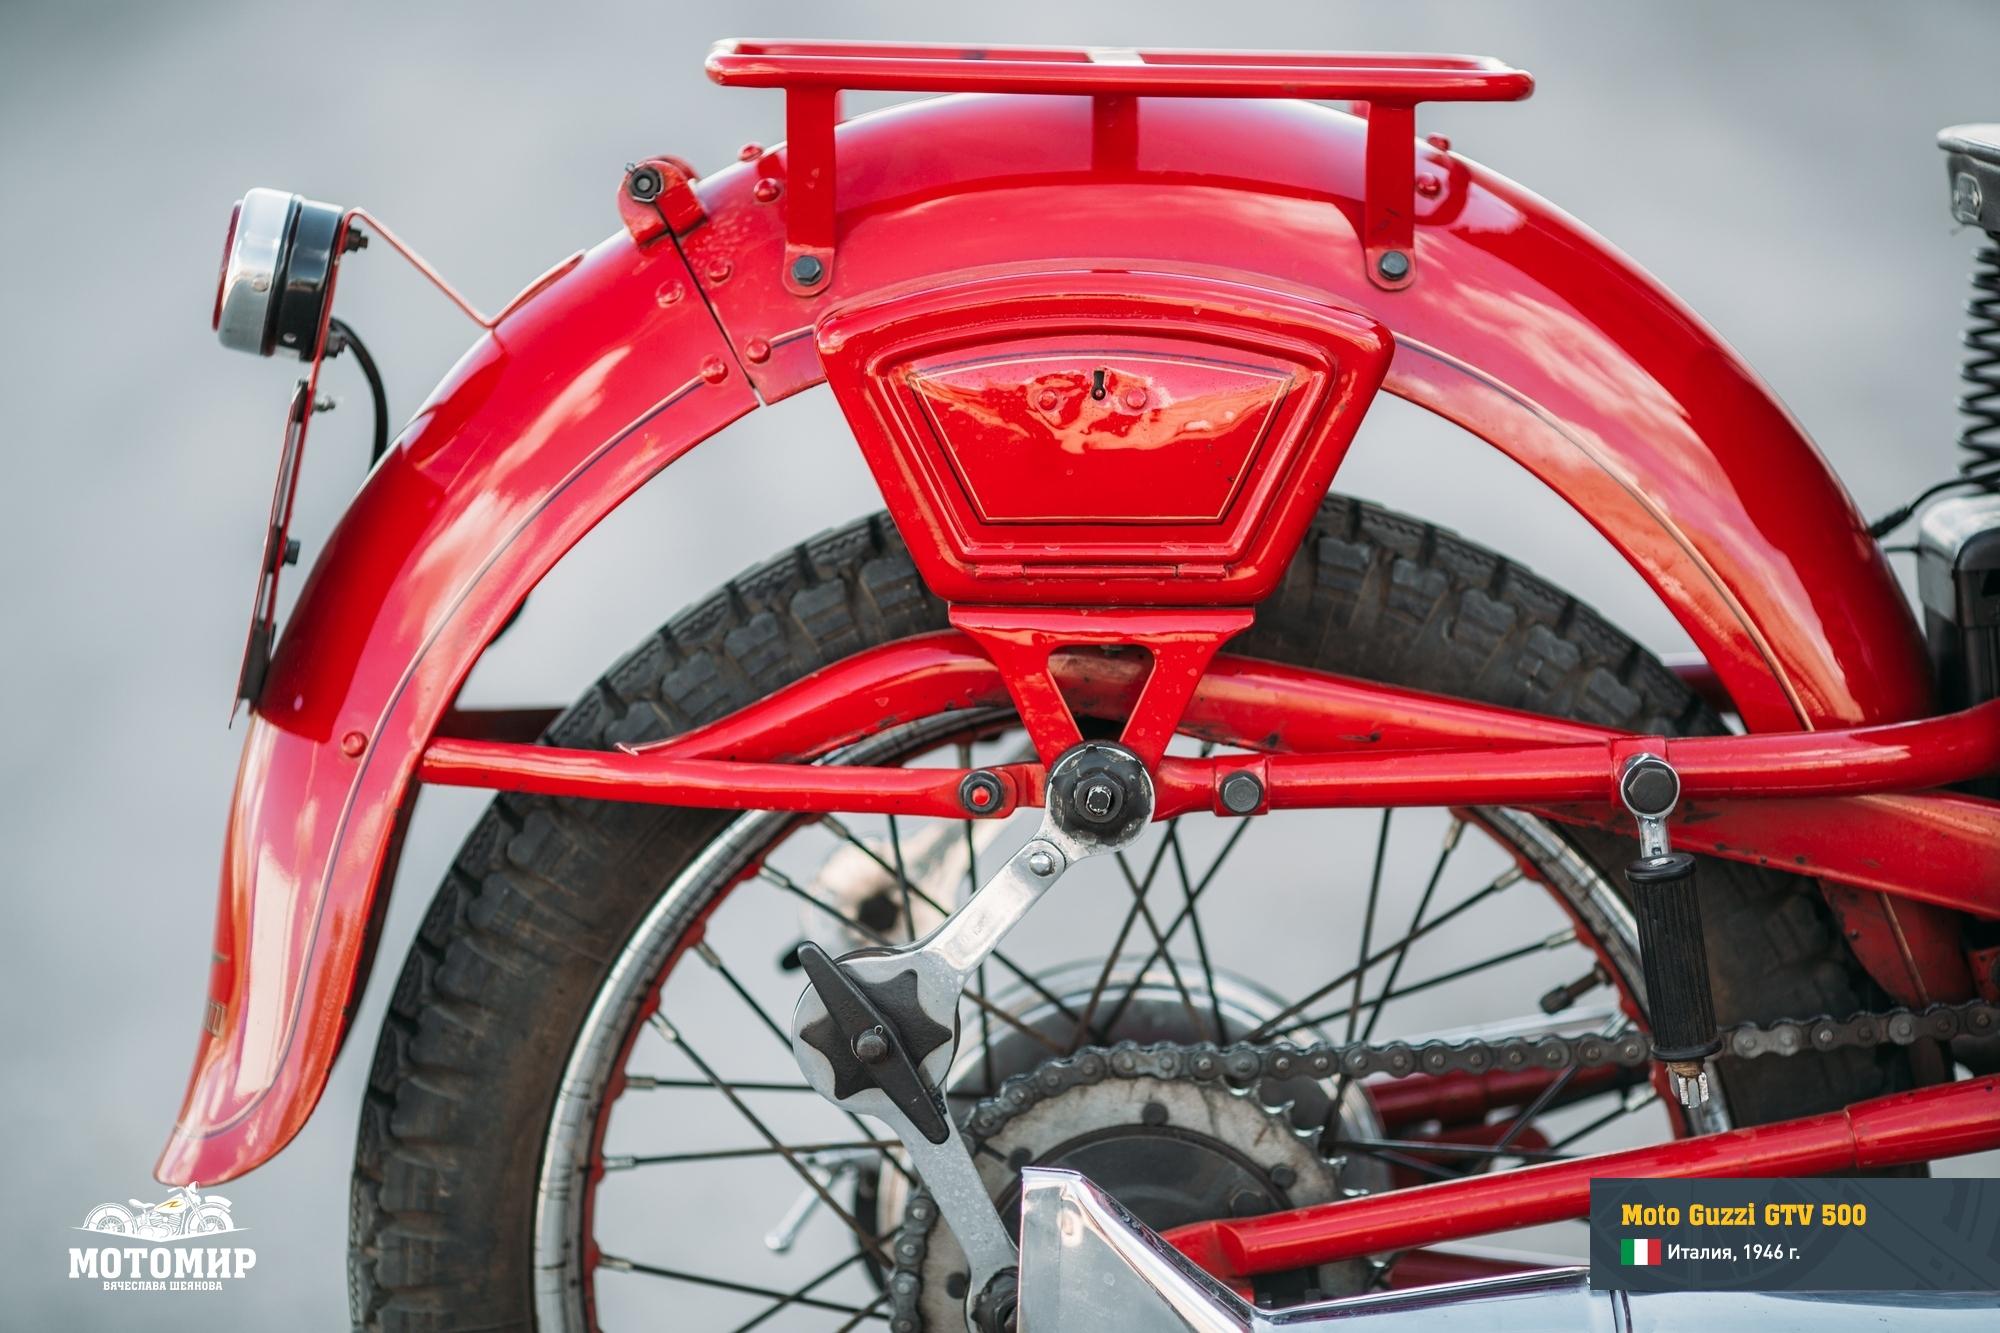 moto-guzzi-gtv-500-201509-web-21